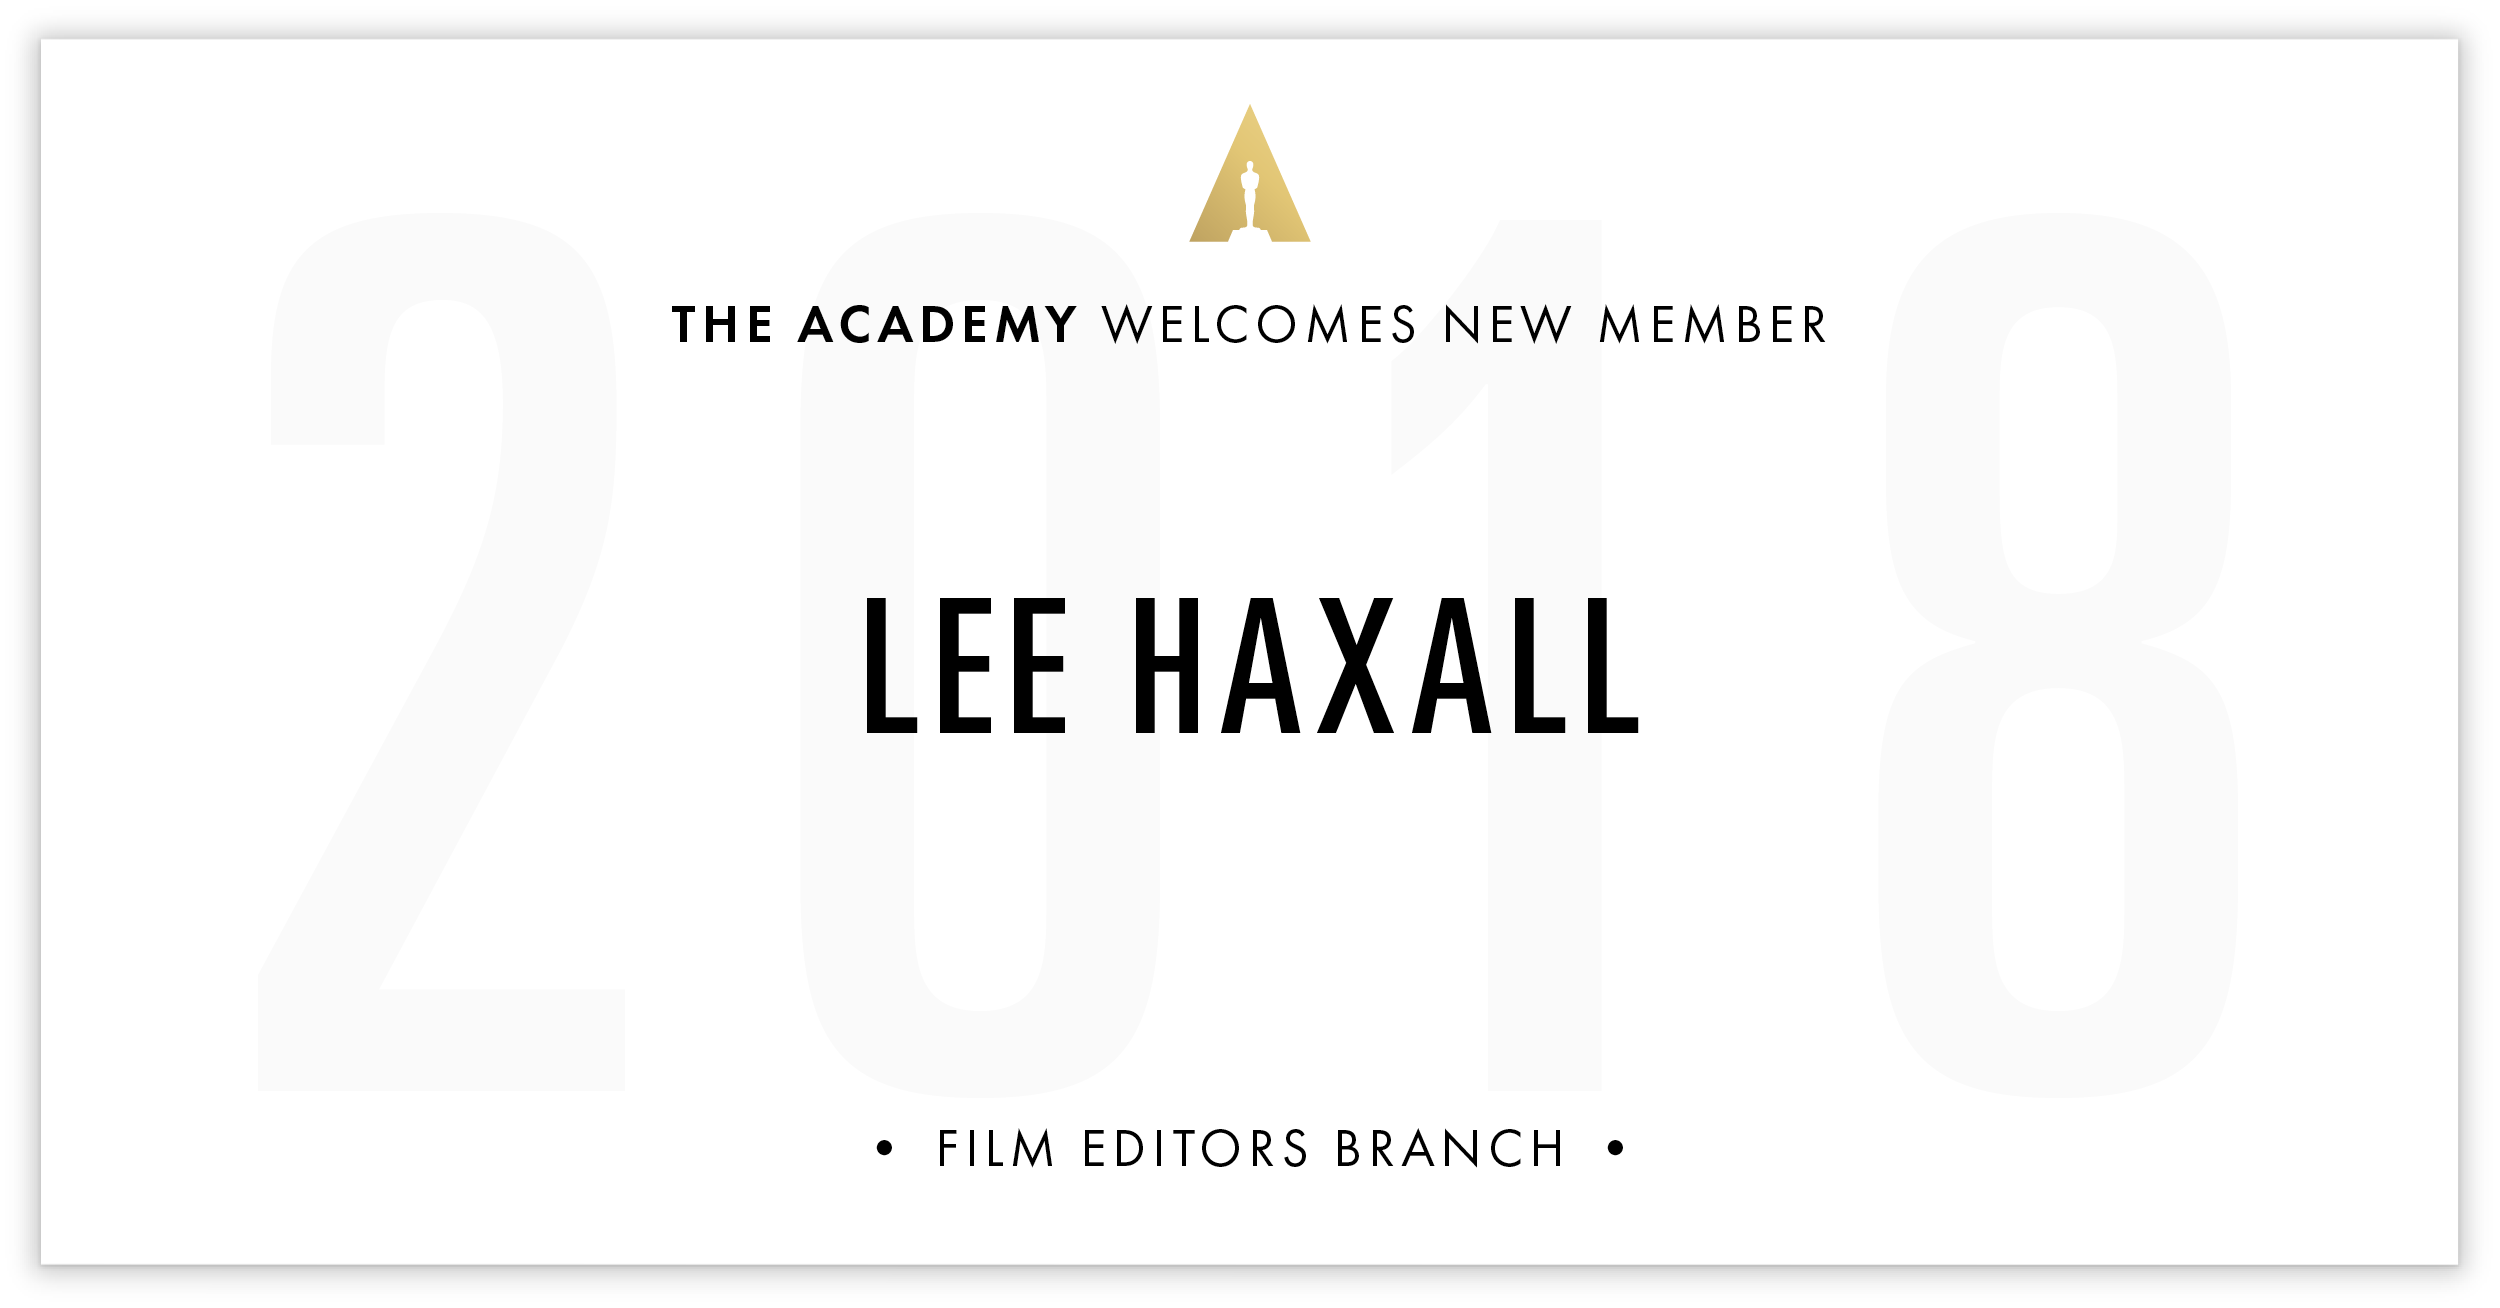 Lee Haxall is invited!